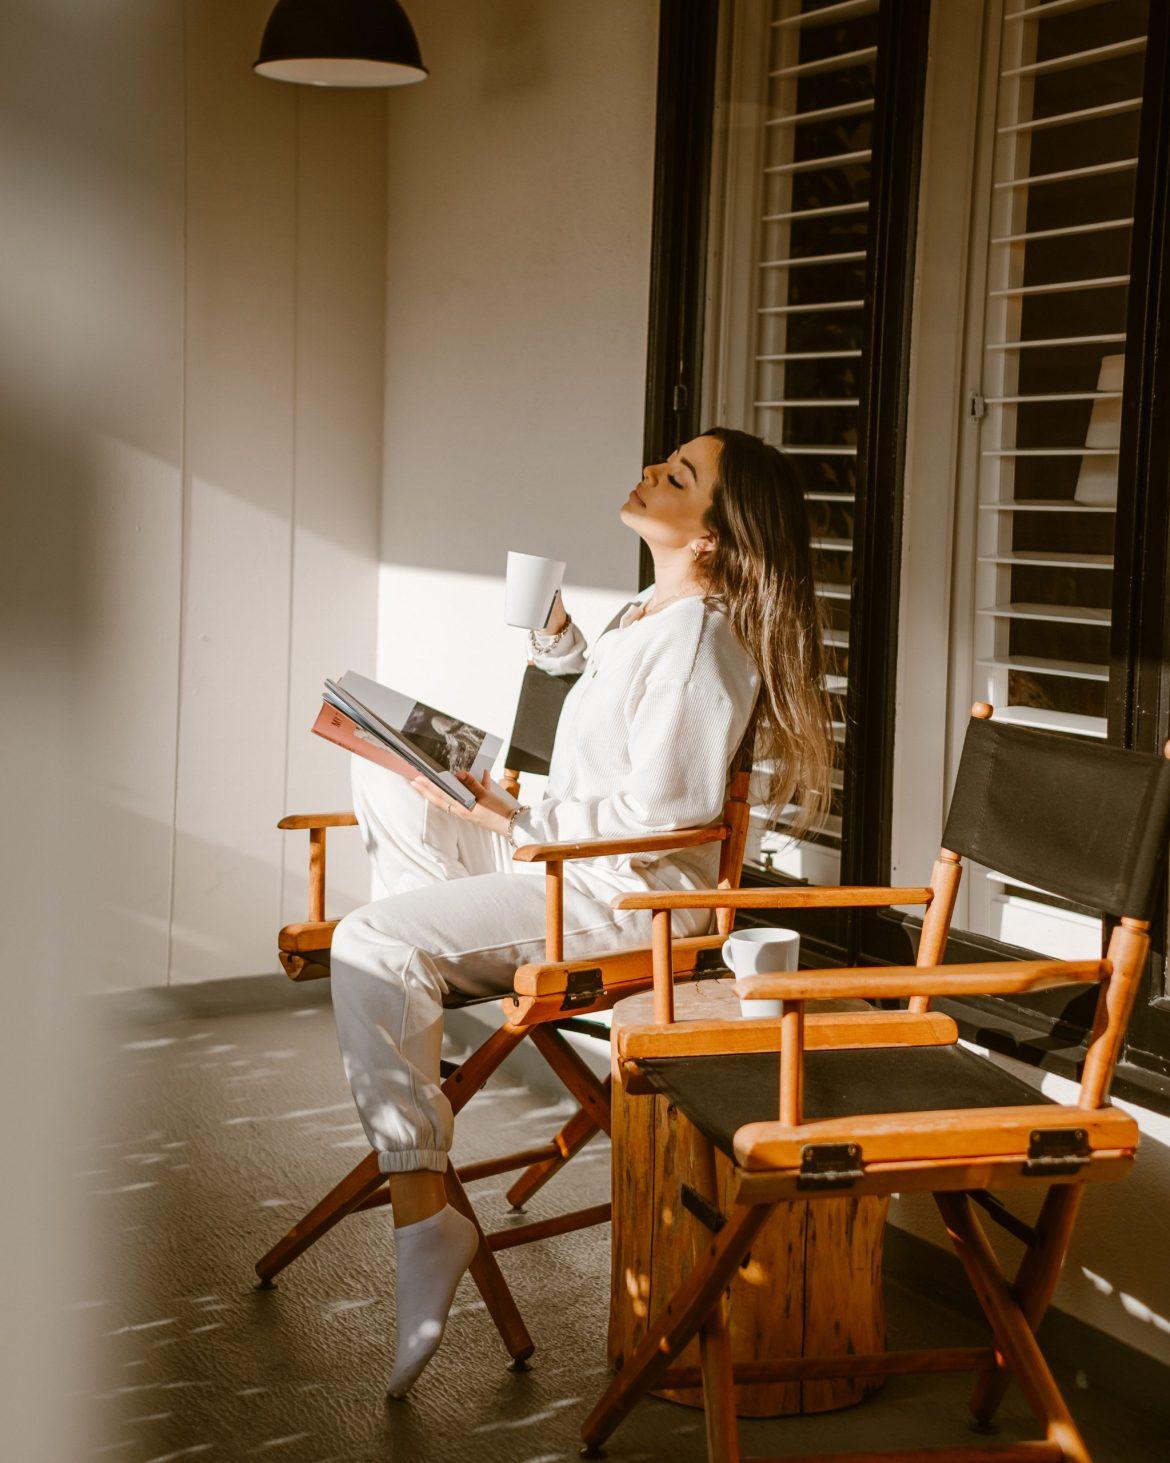 girl photography, creative photography, girl enjoying a book in the sun